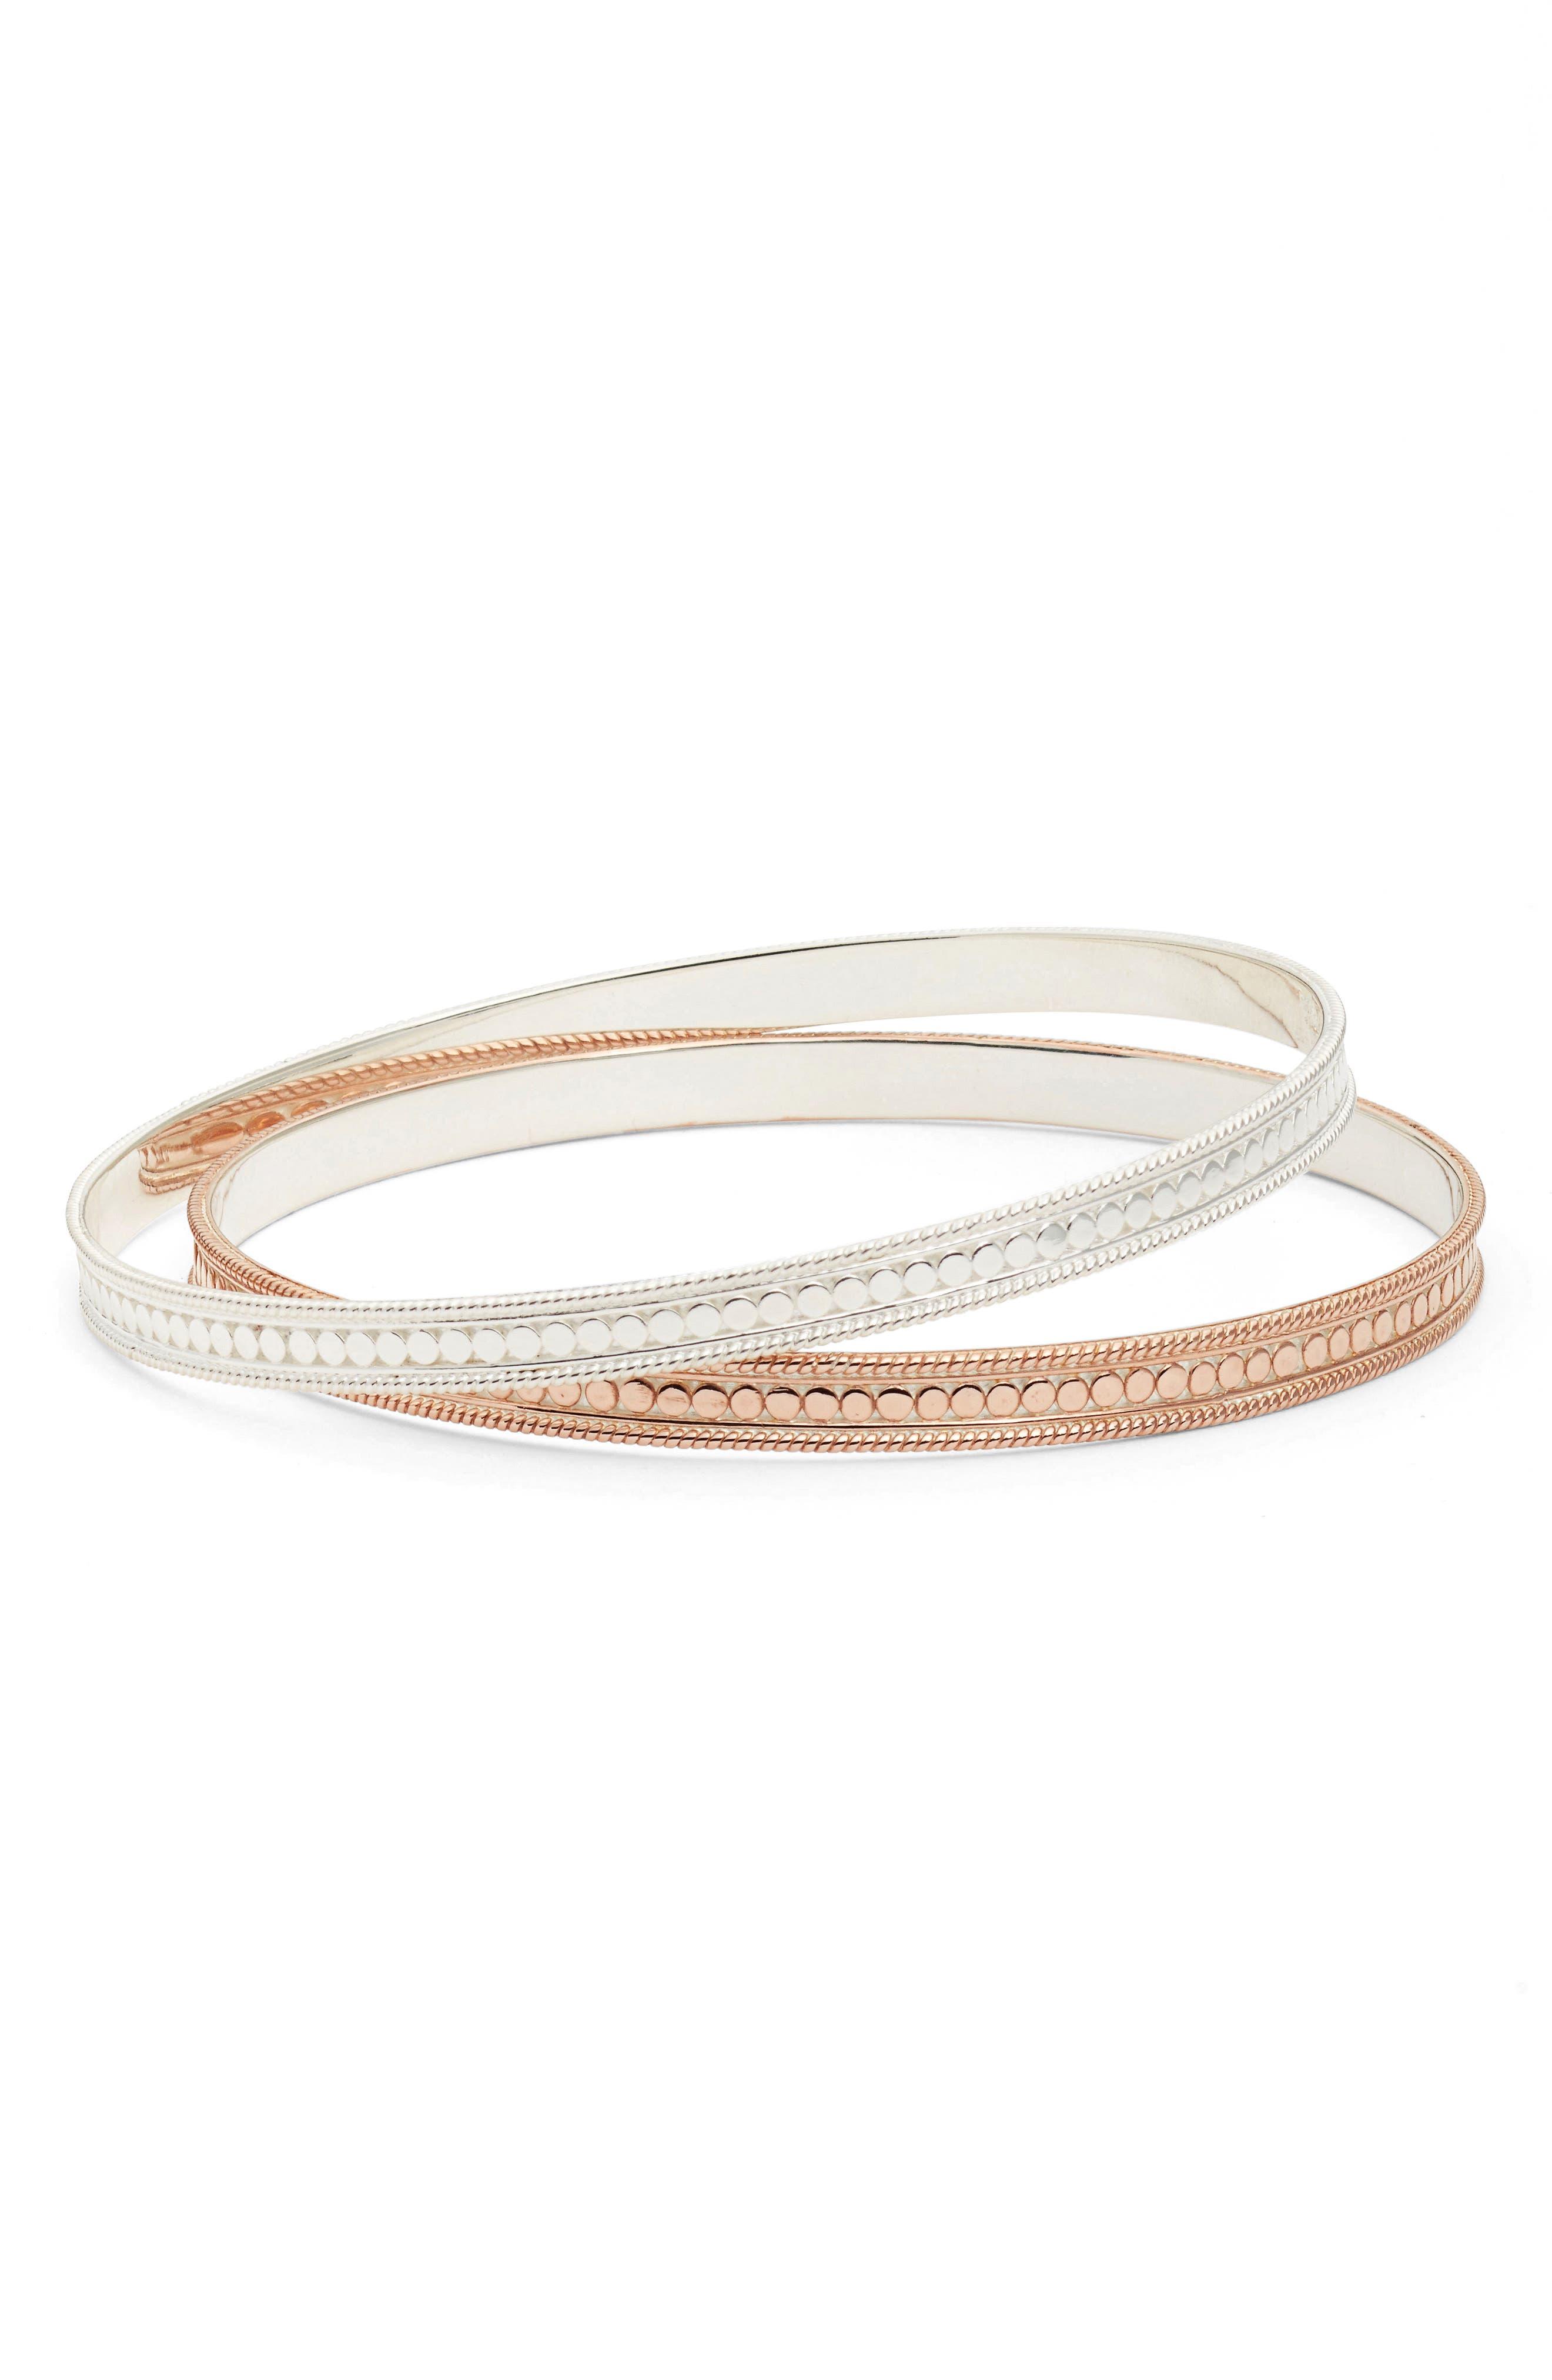 Set of 2 Bangle Bracelets,                         Main,                         color, 712